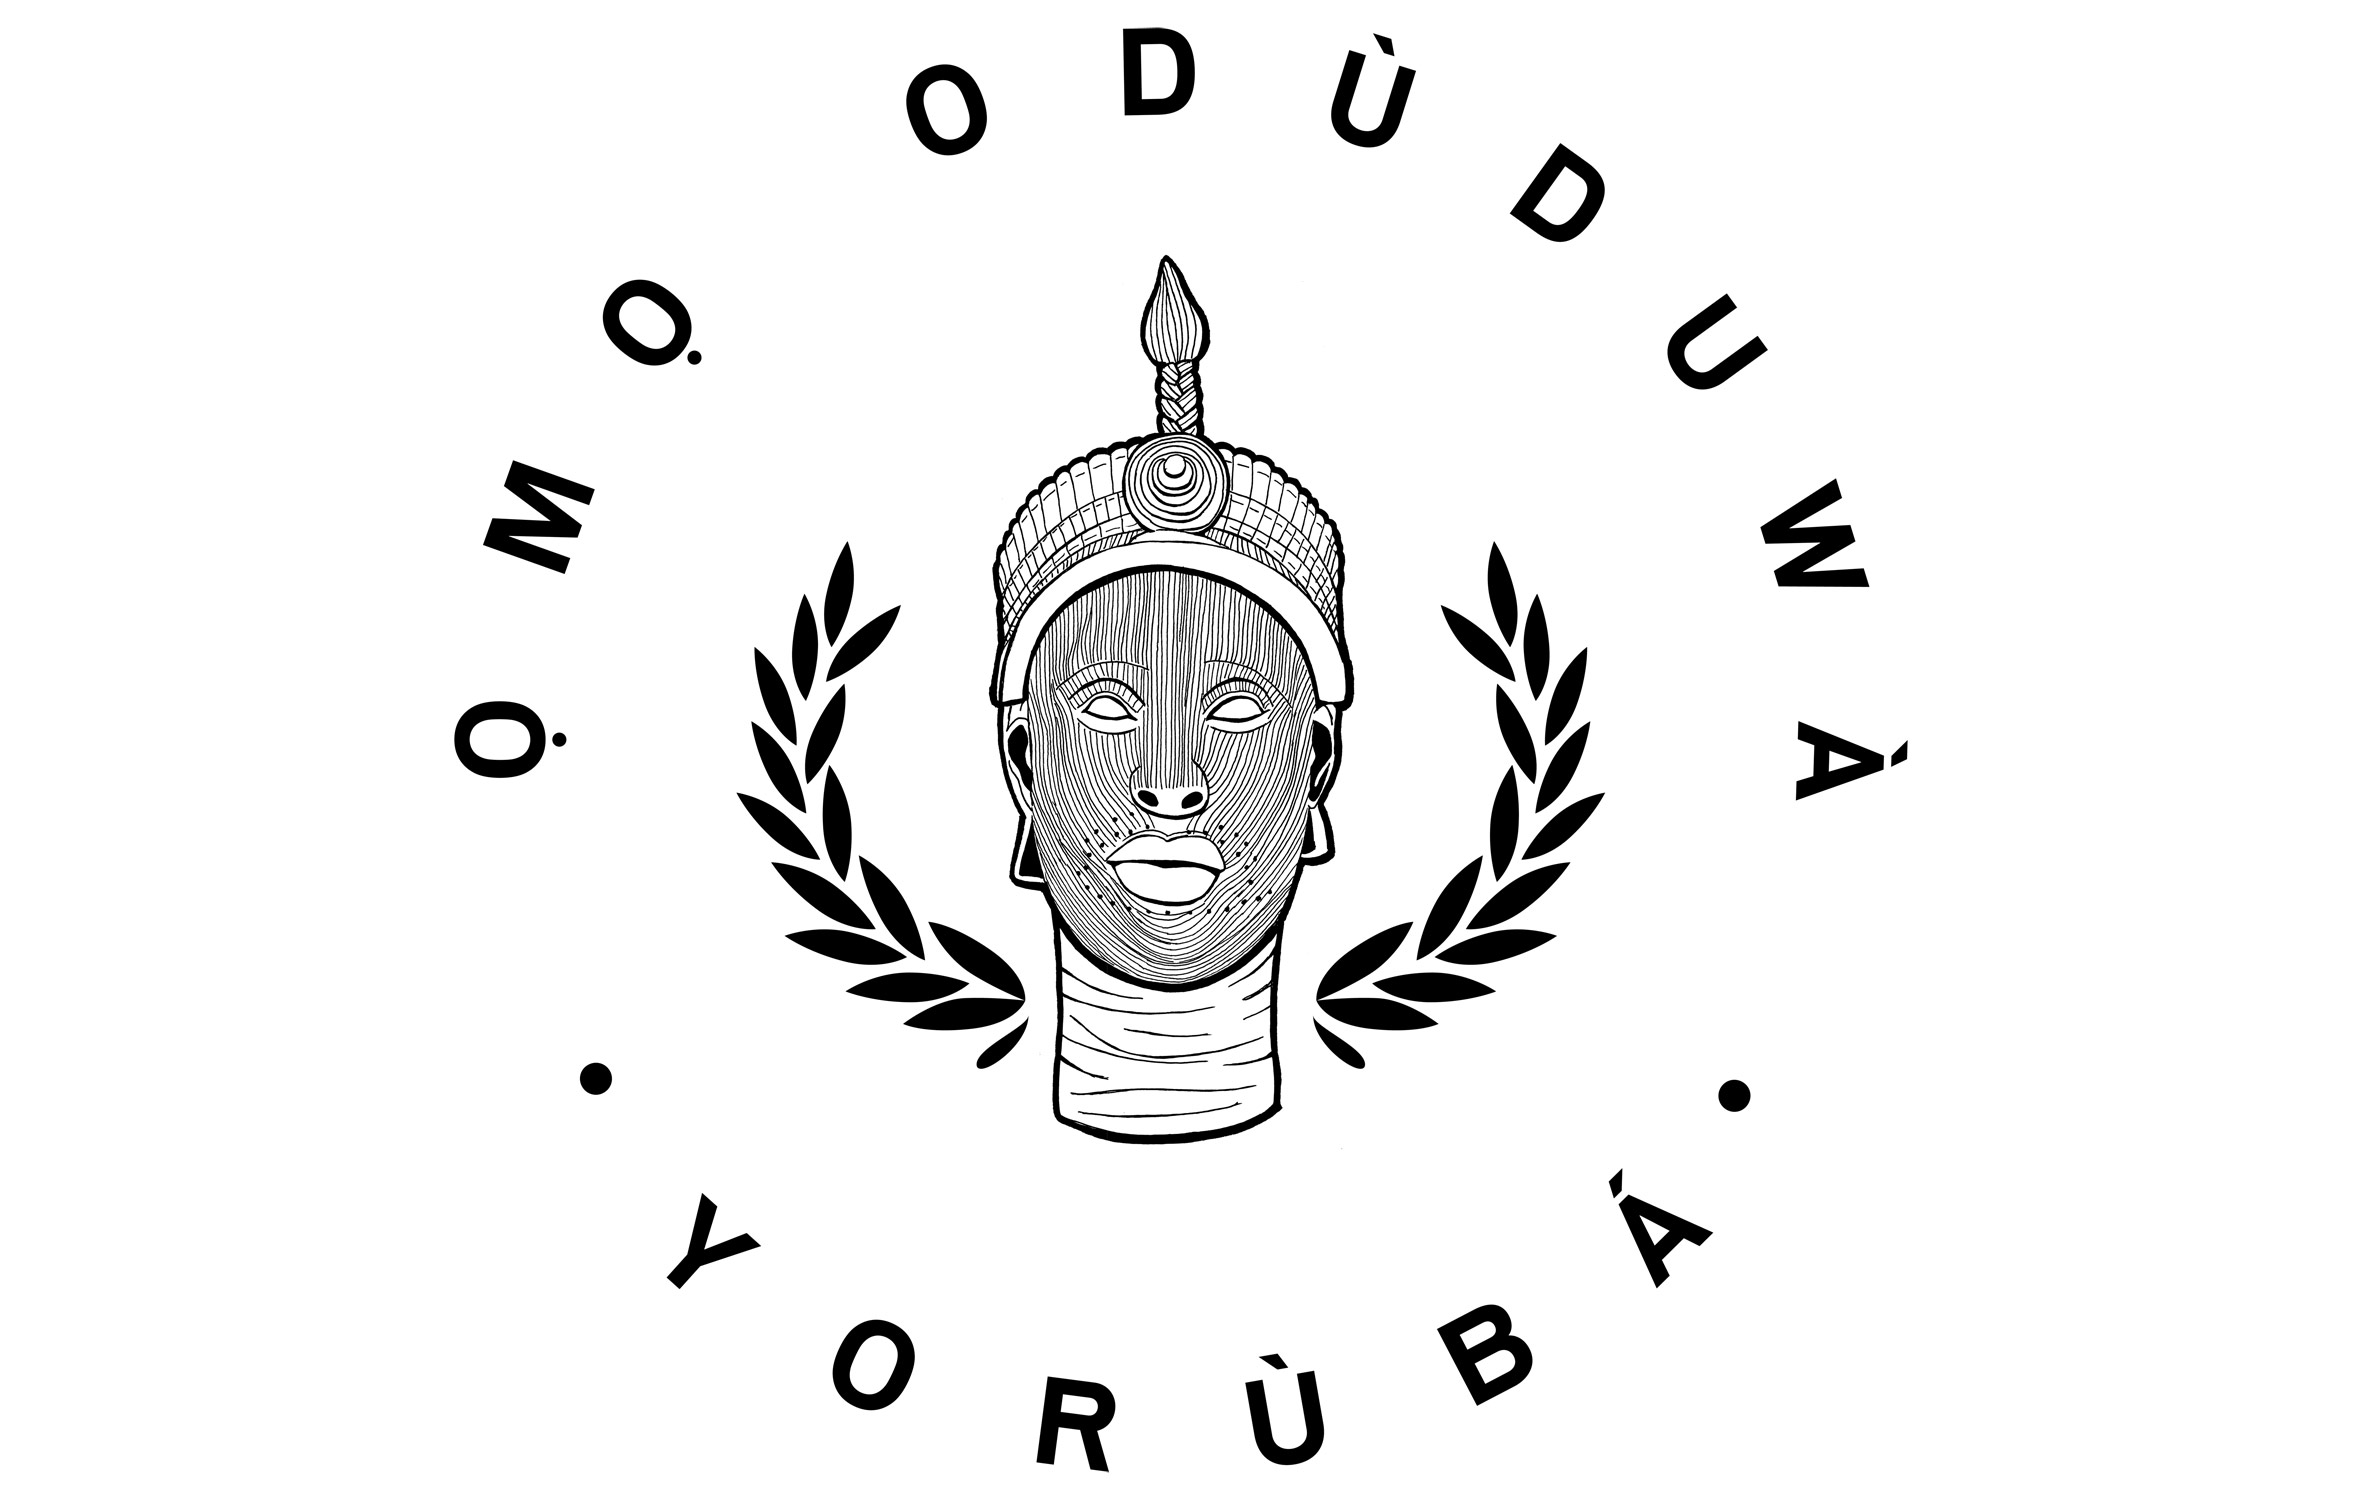 omo oduduwa, yoruba, regla de ocha, lukumi, diccionario, dictionary, orisha image